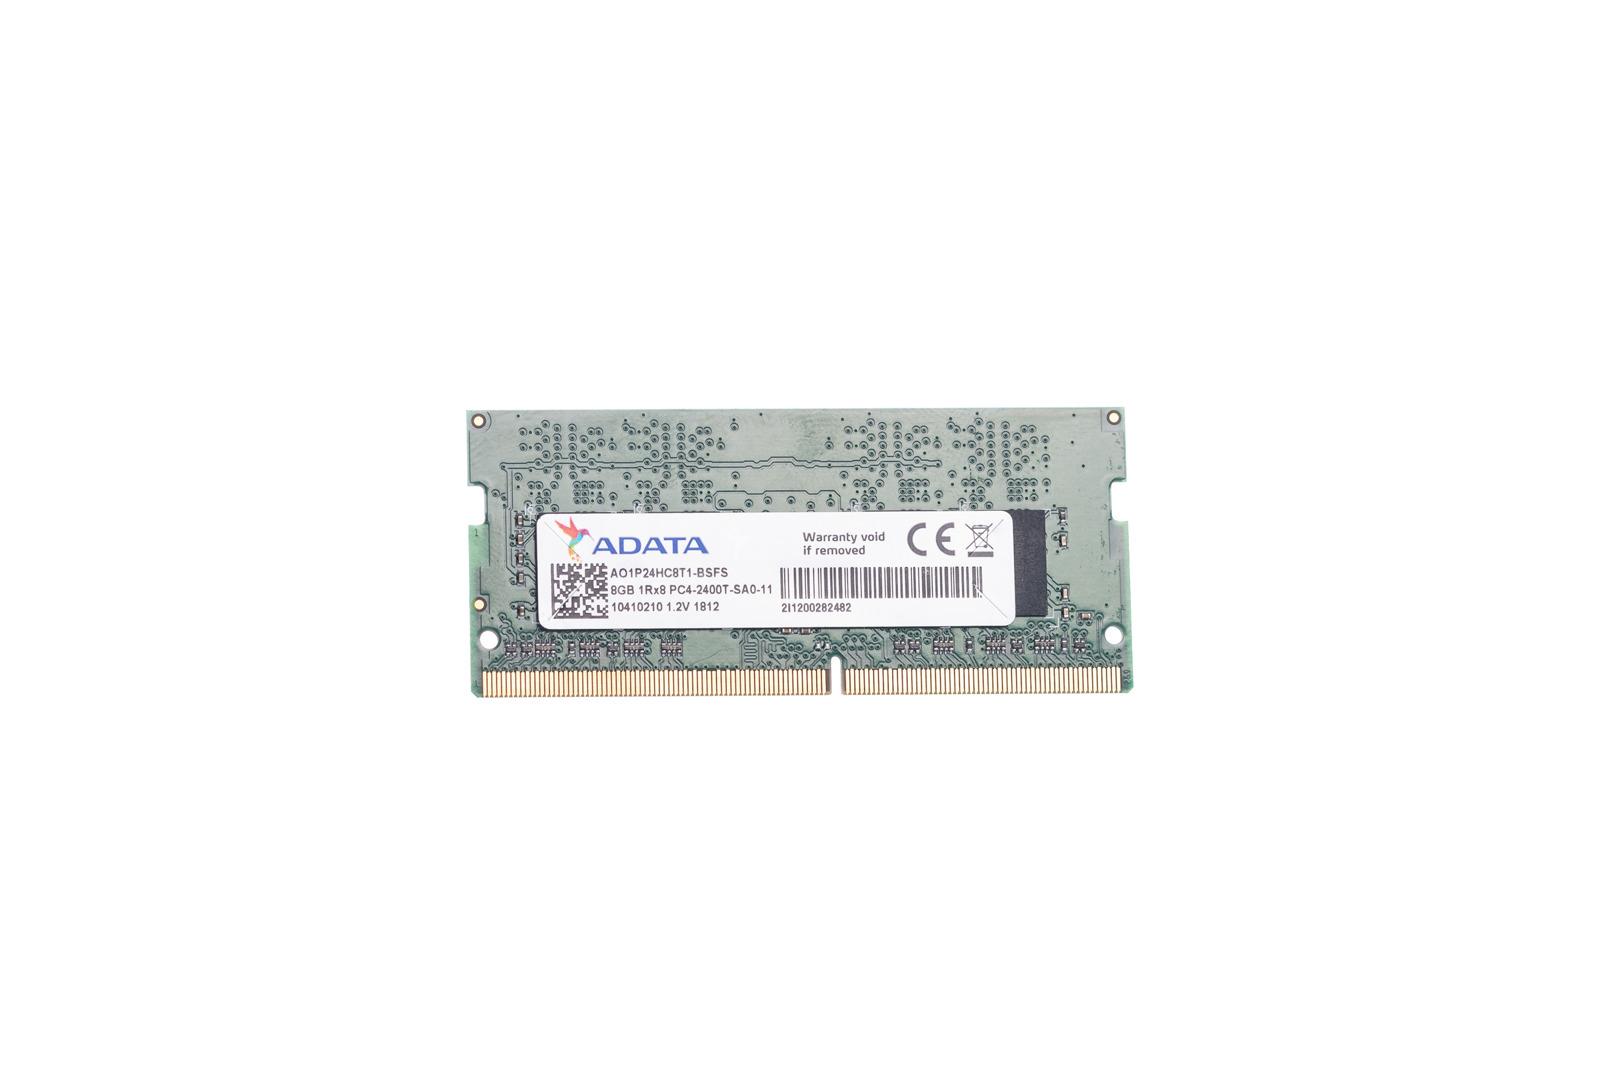 Memory RAM ADATA 8GB DDR4 AO1P24HC8T1-BSFS